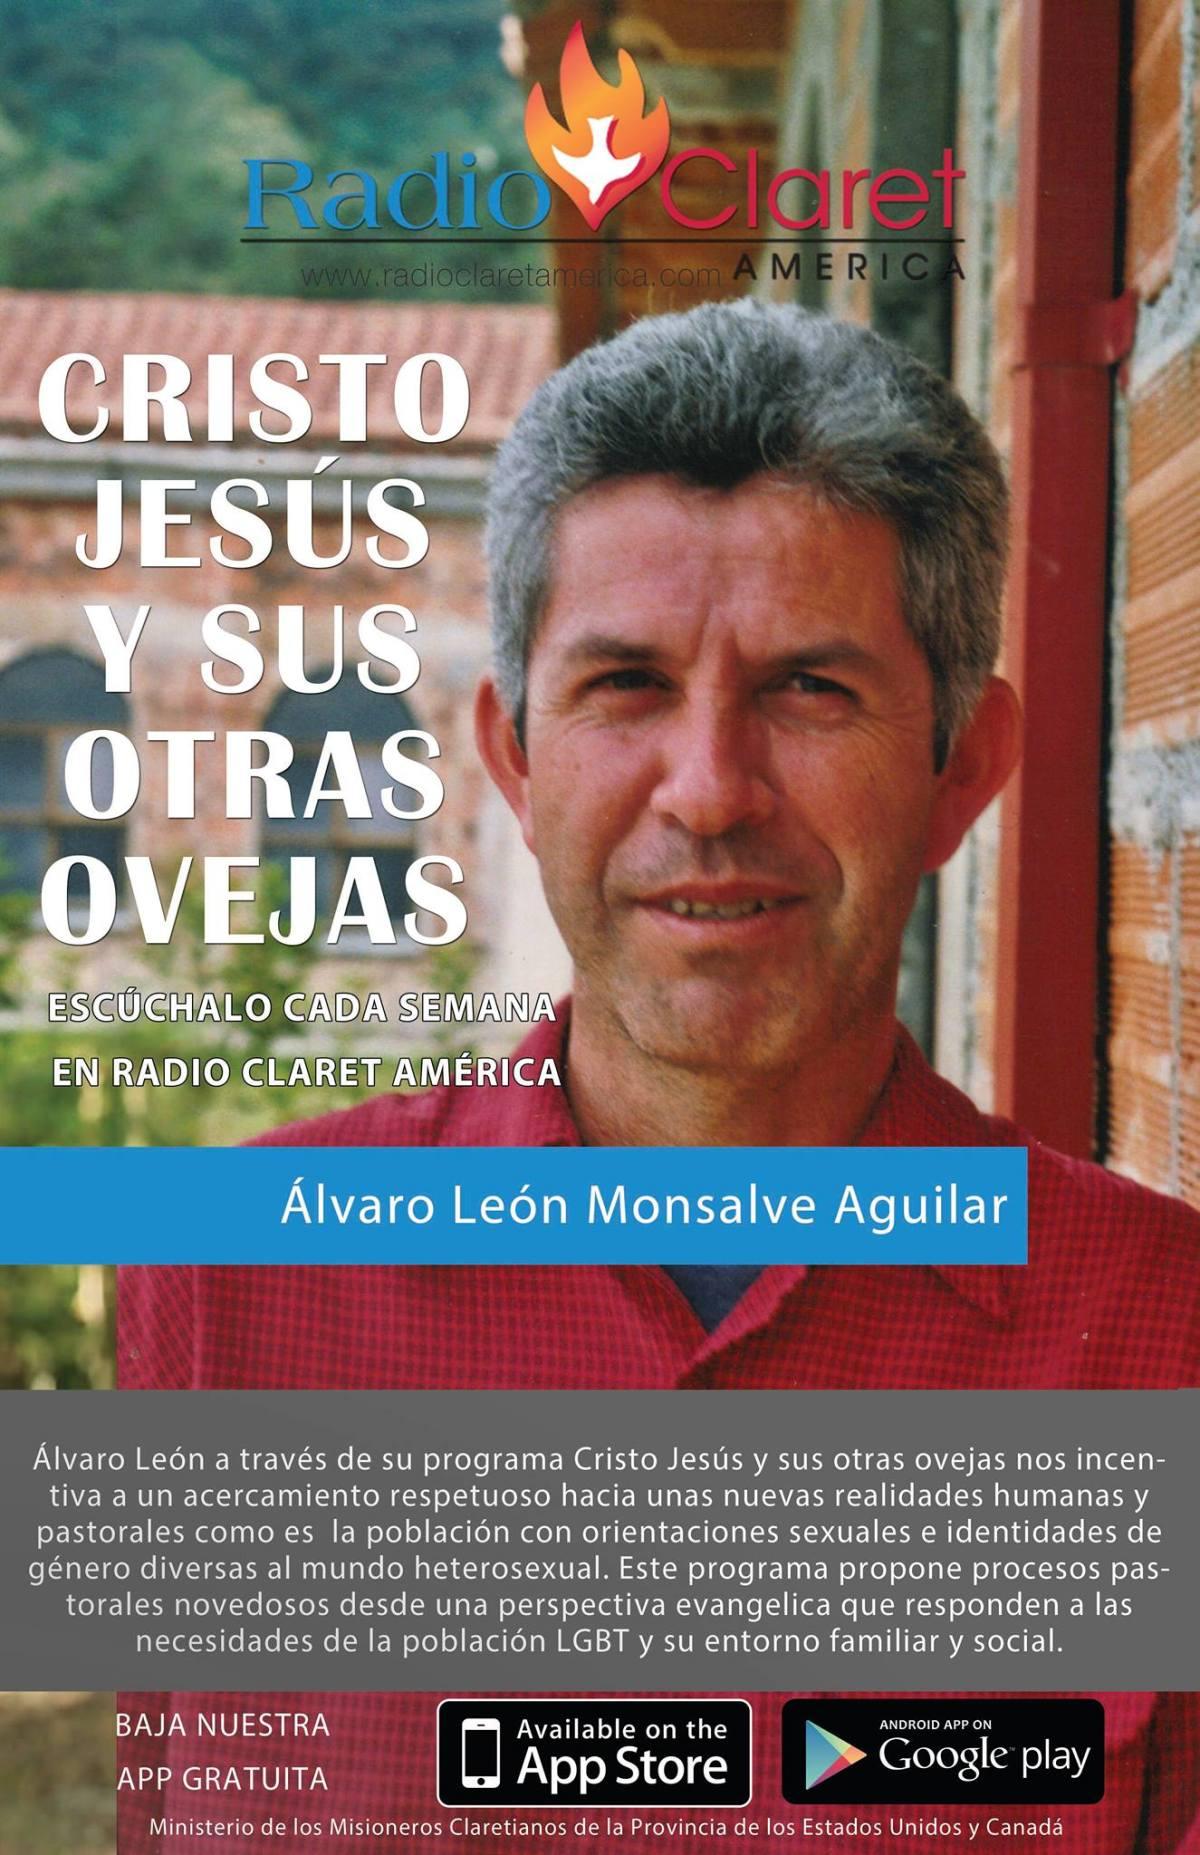 ALVARO LEON MONSALVE AGUILAR